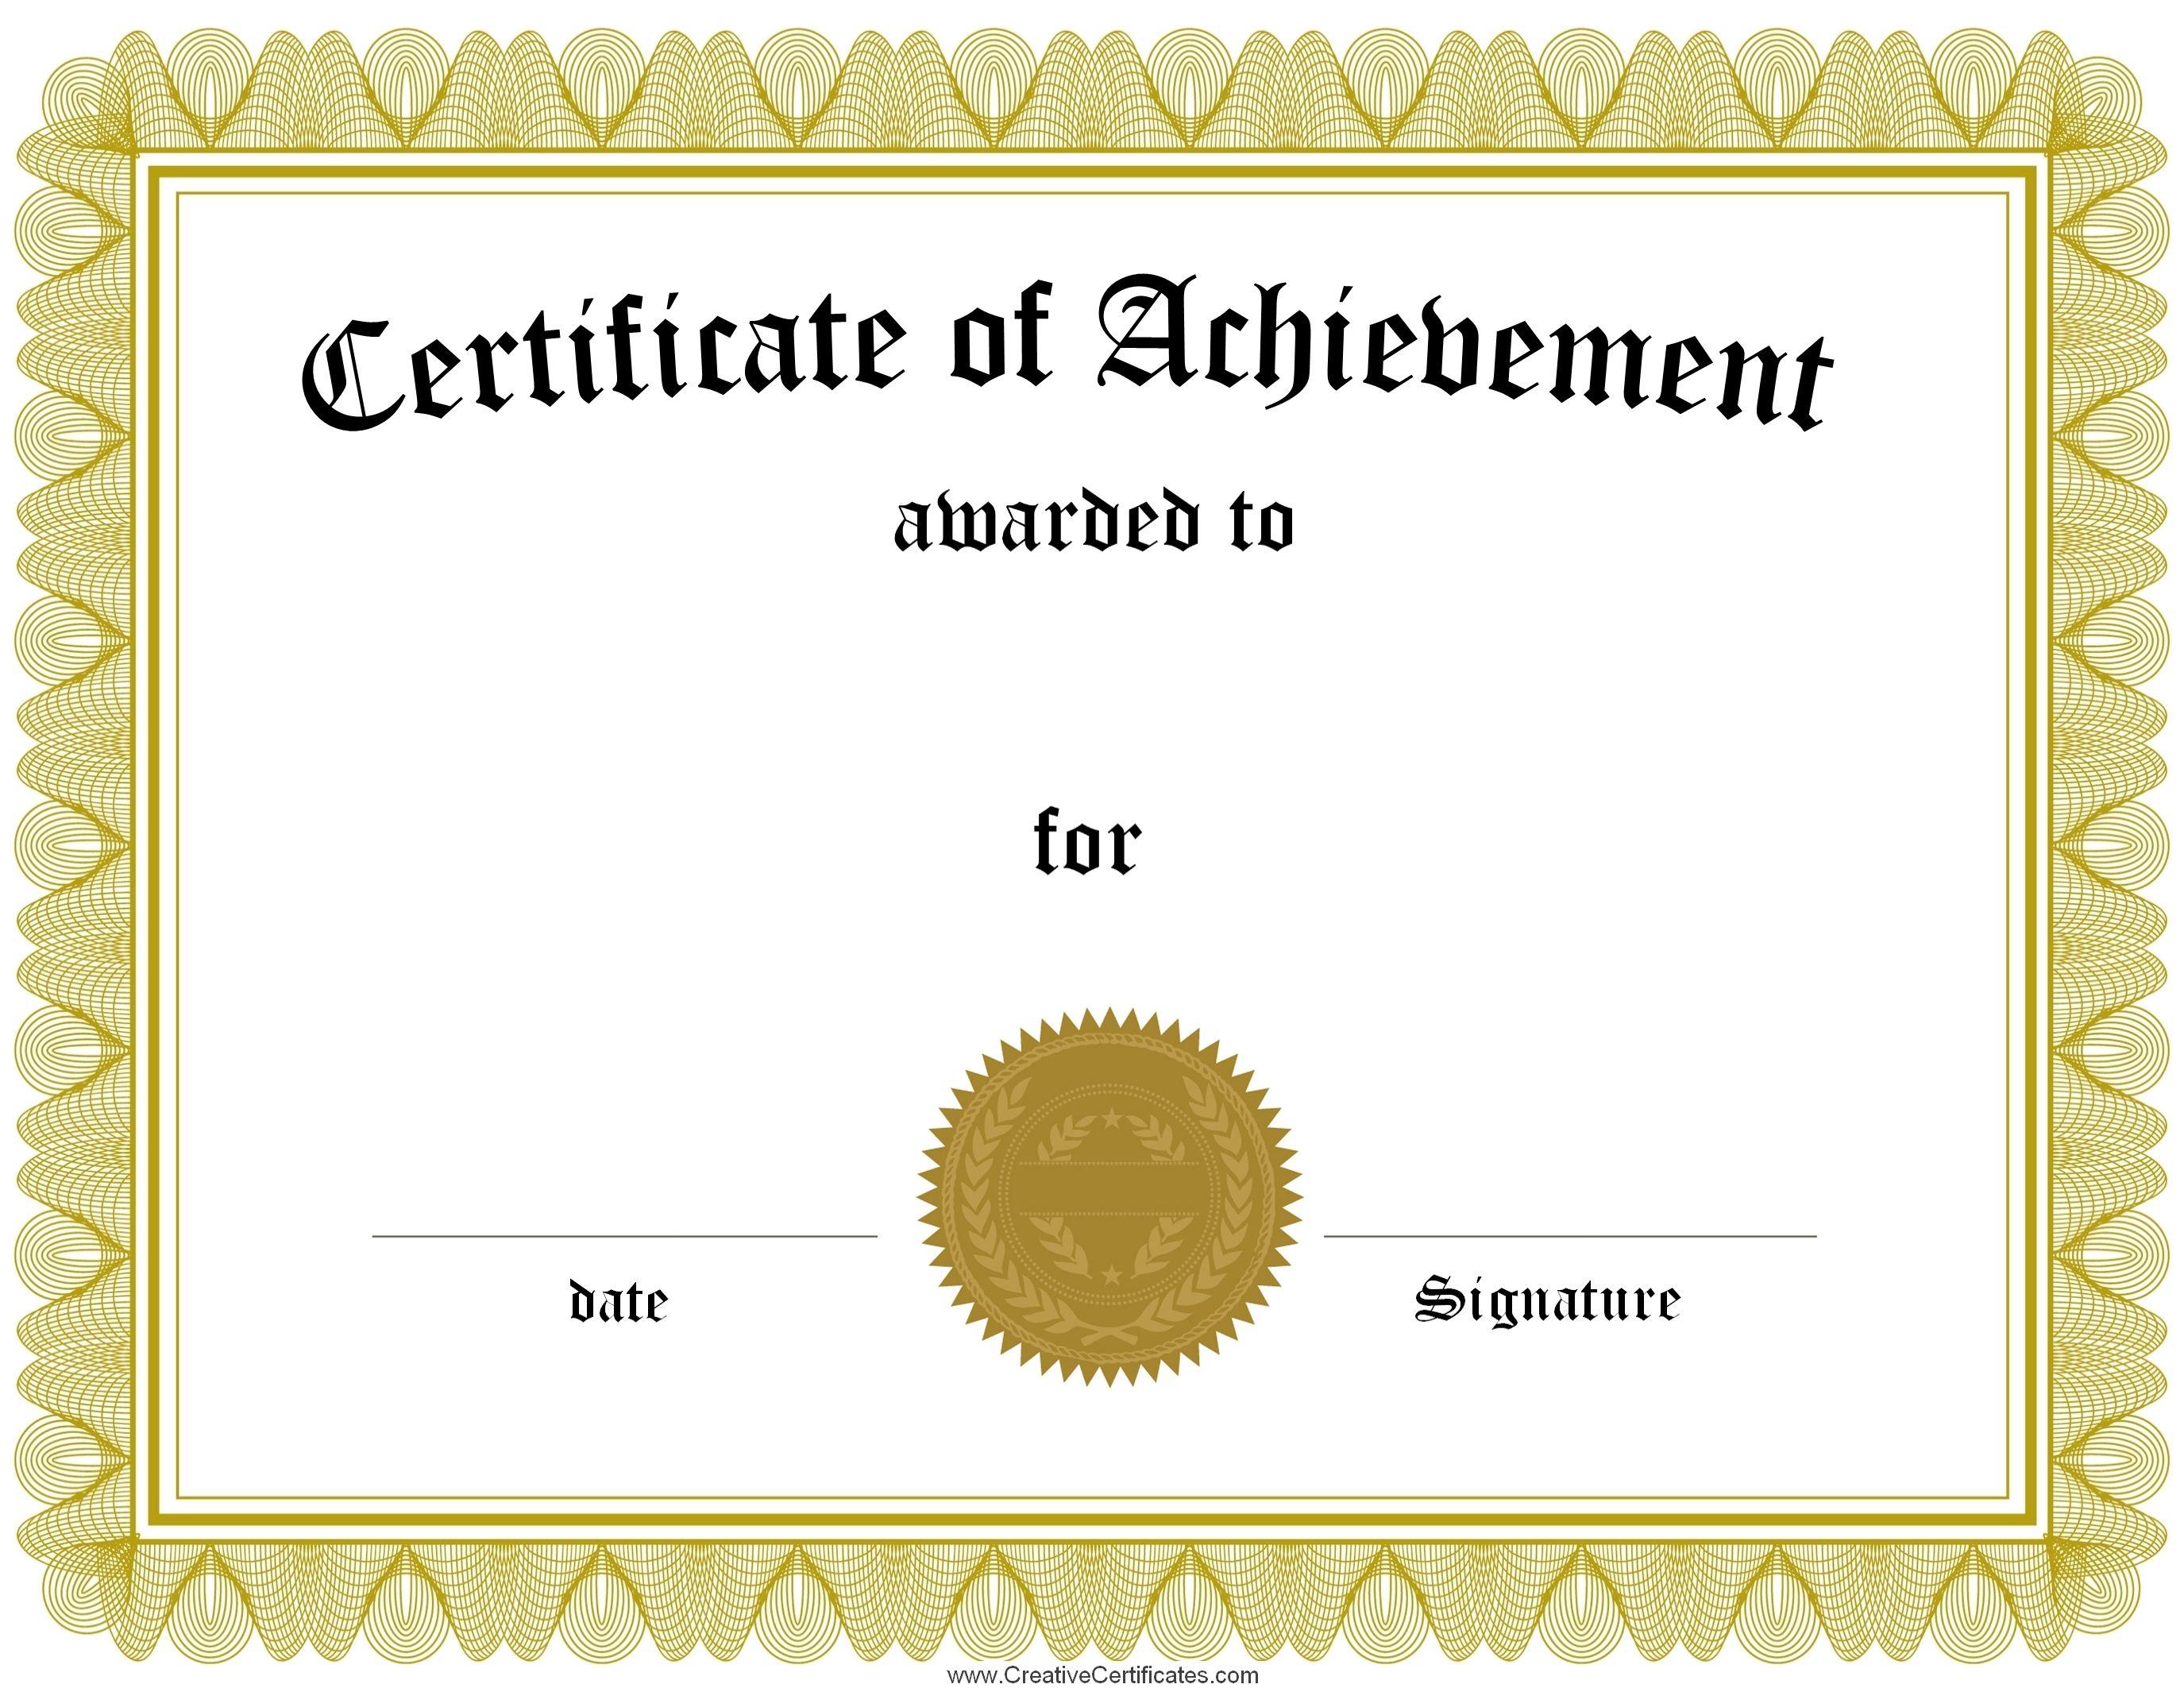 Award Certificate Template Certificate Templates Best Free Inside Blank Certificate Of Achievement Template